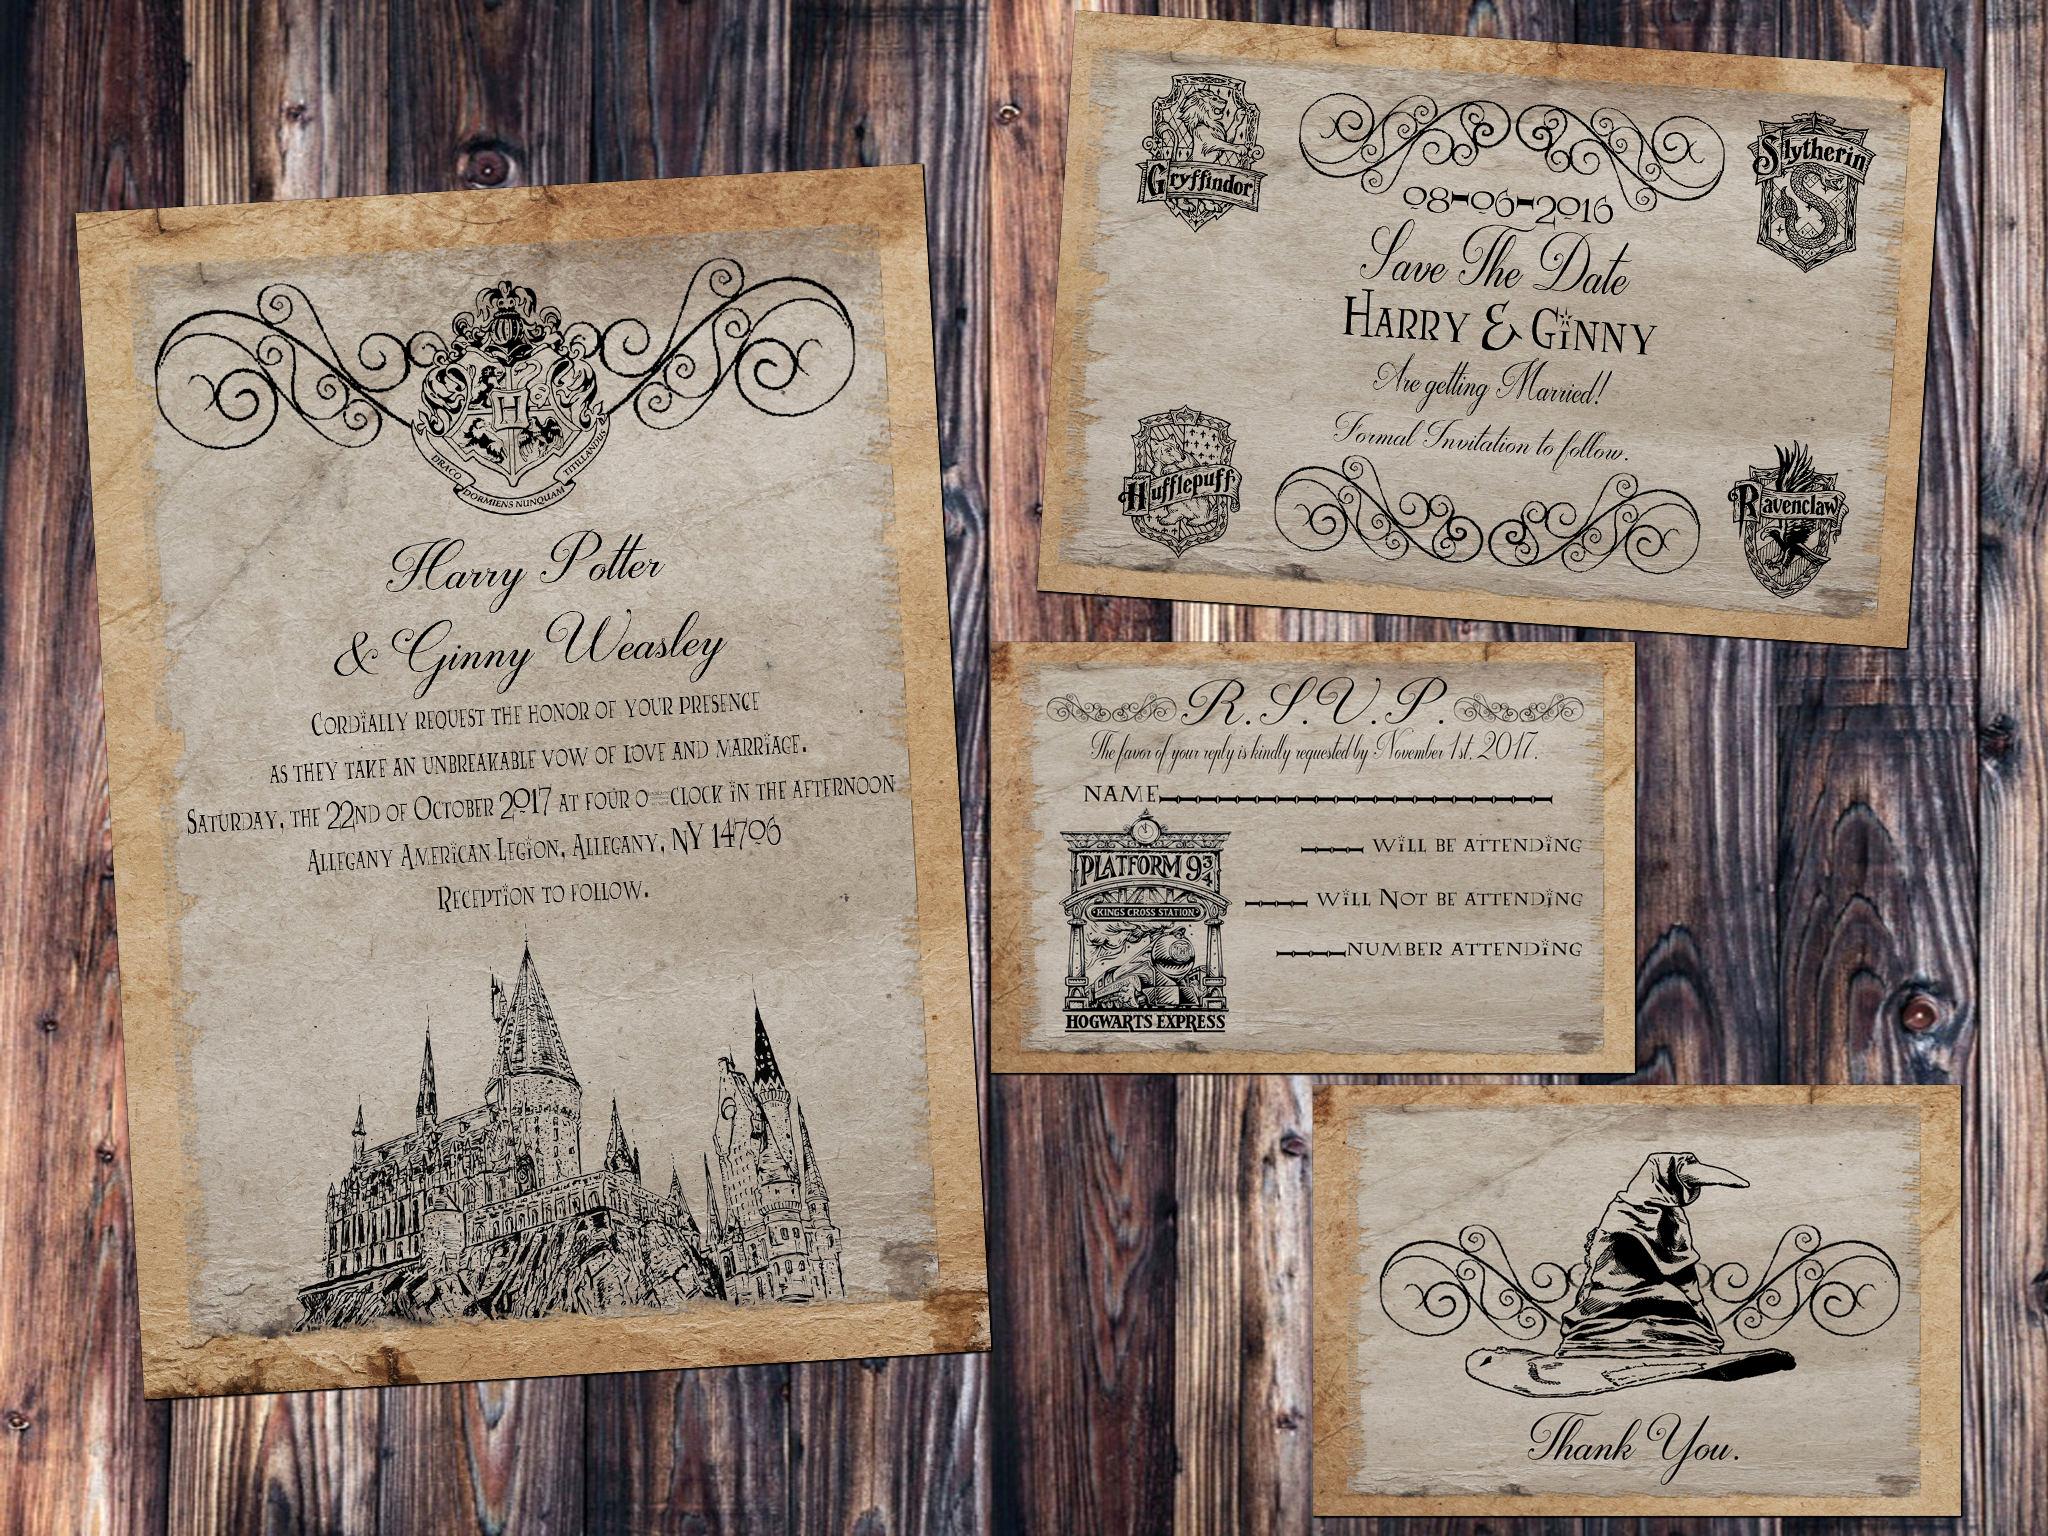 Harry Potter Wedding Invitation Elegant Hogwarts Parchment Wedding Invitation Save the Date Rsvp